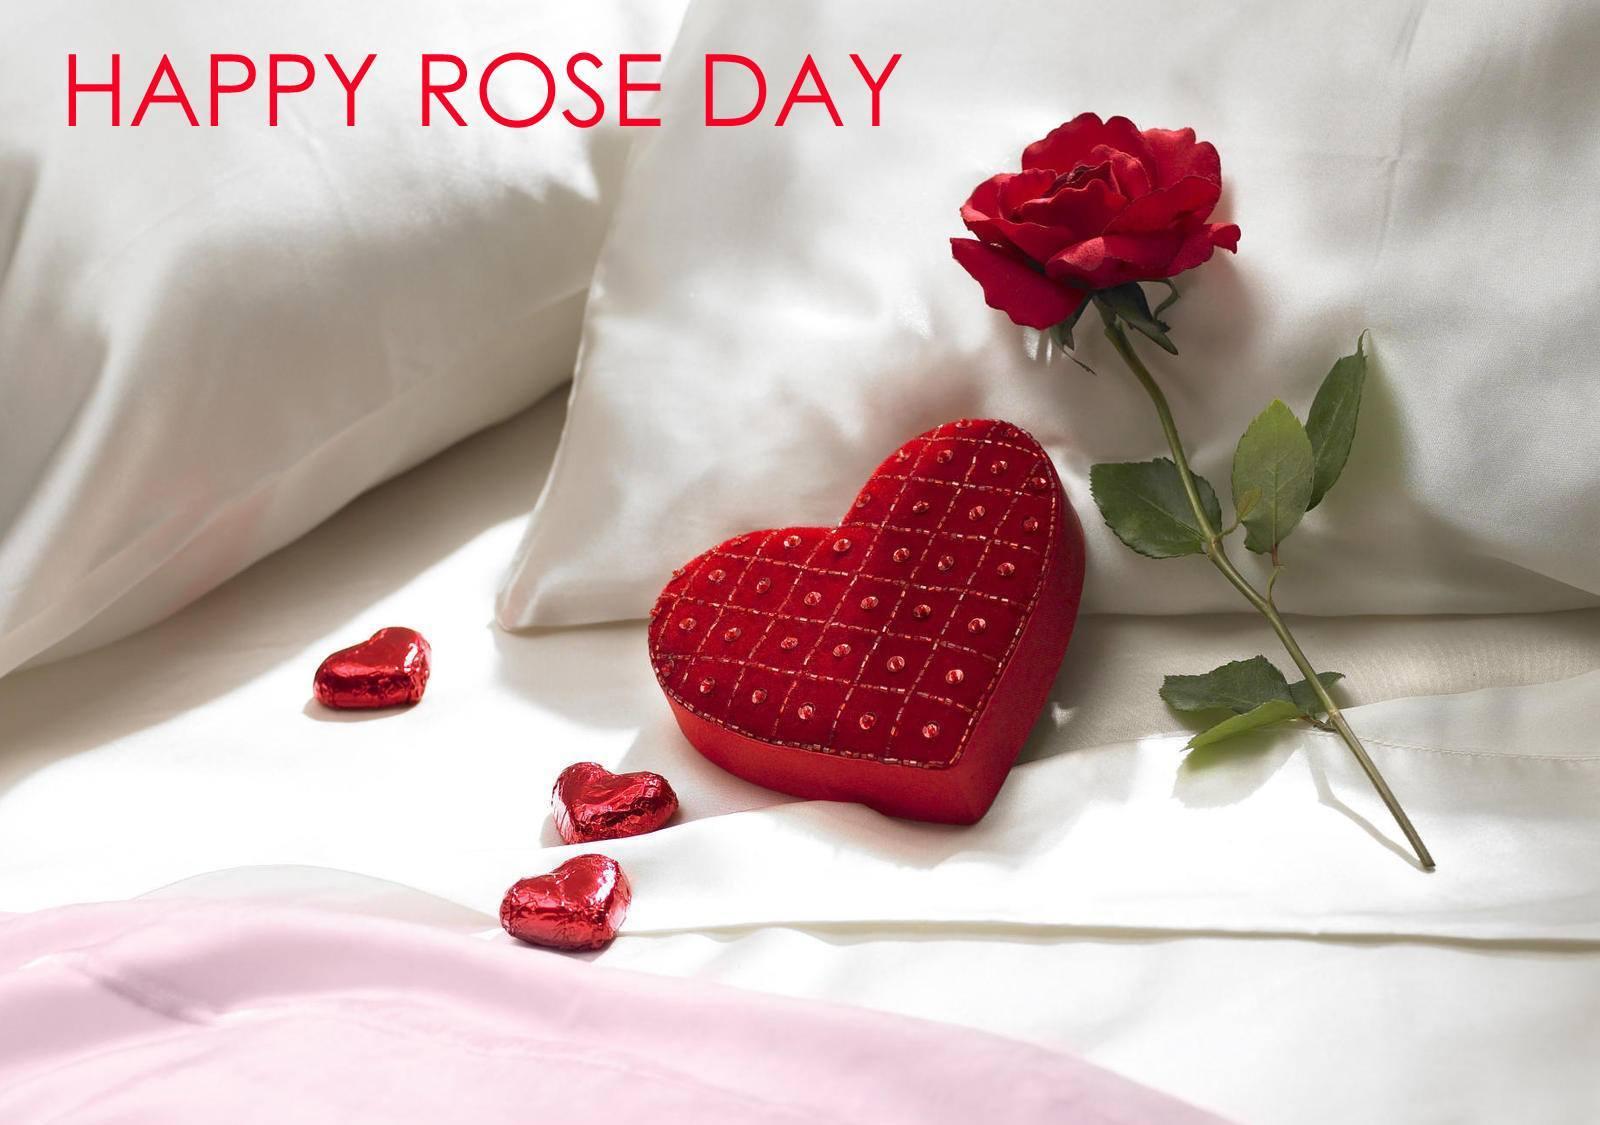 happy-rose-day-wallpaper-2016